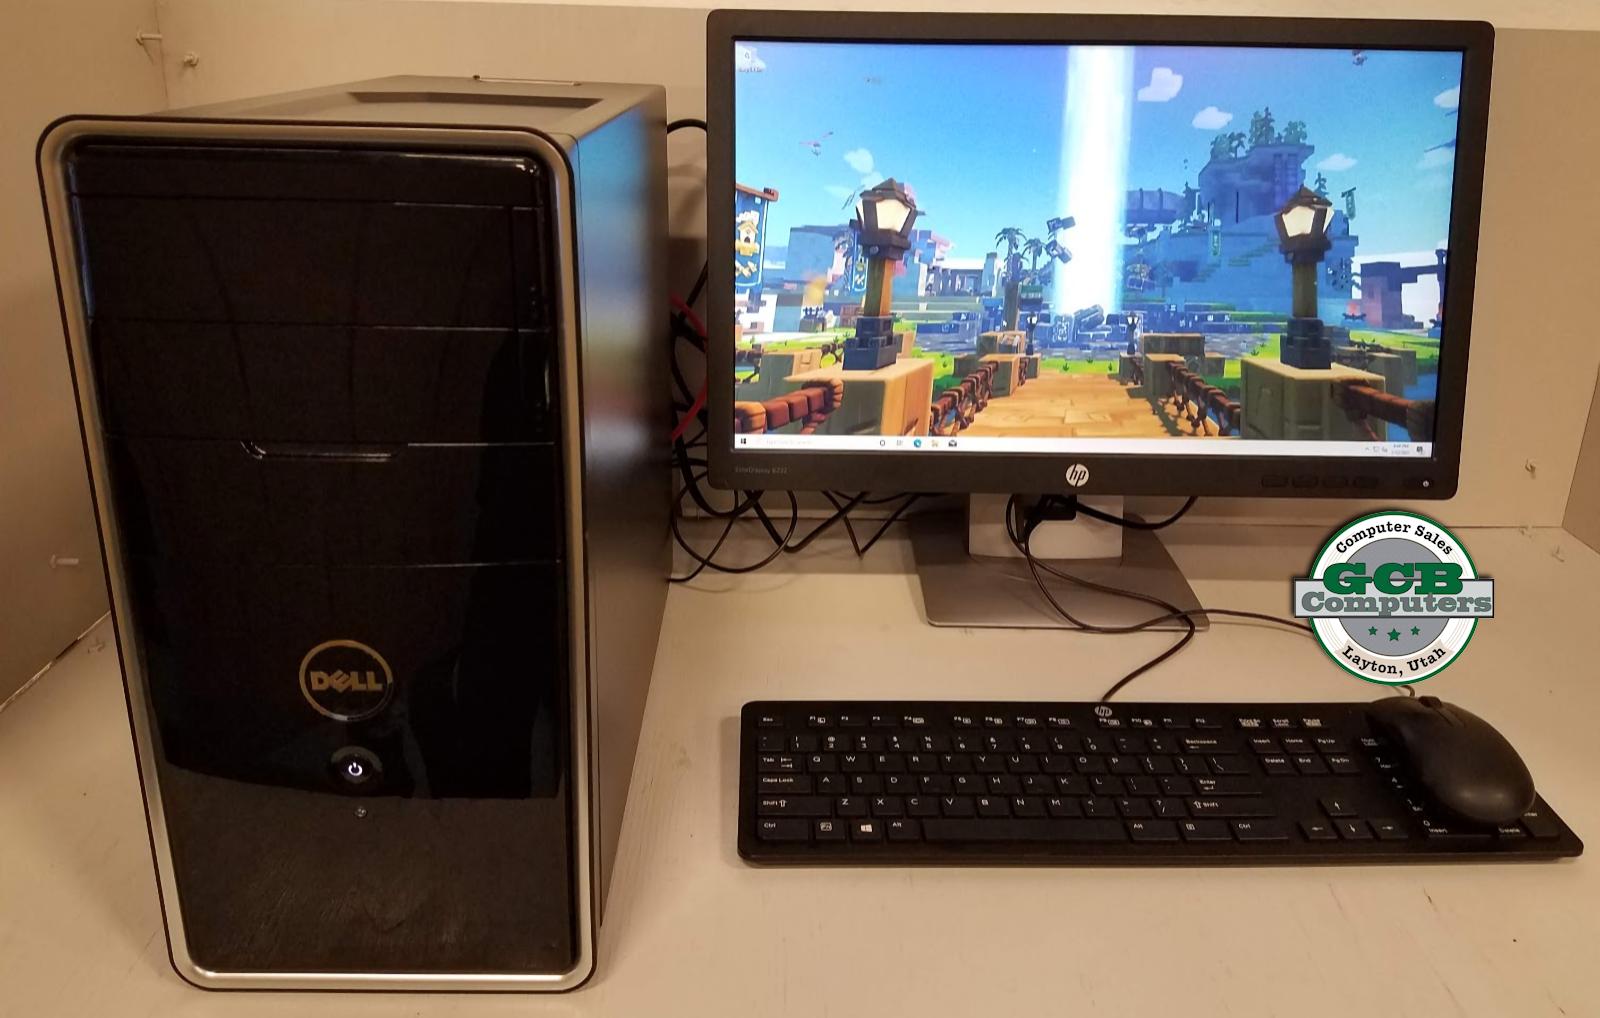 $400 Dell i7 Gamer w/ GTX 960 256GB SSD